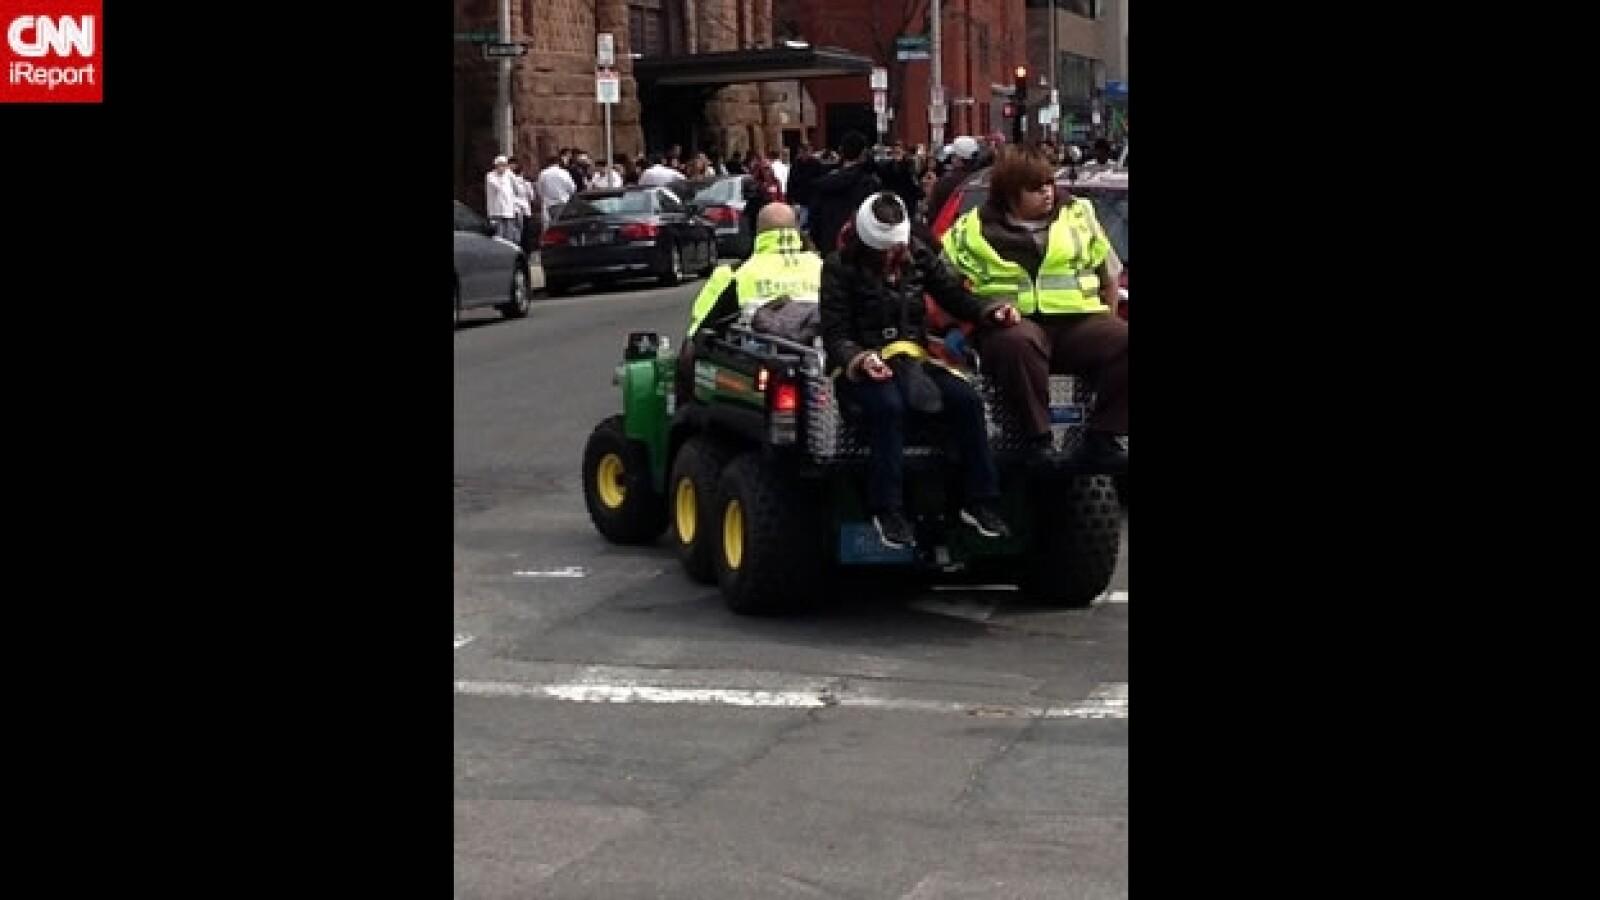 Maratón de Boston ataque iReport 04